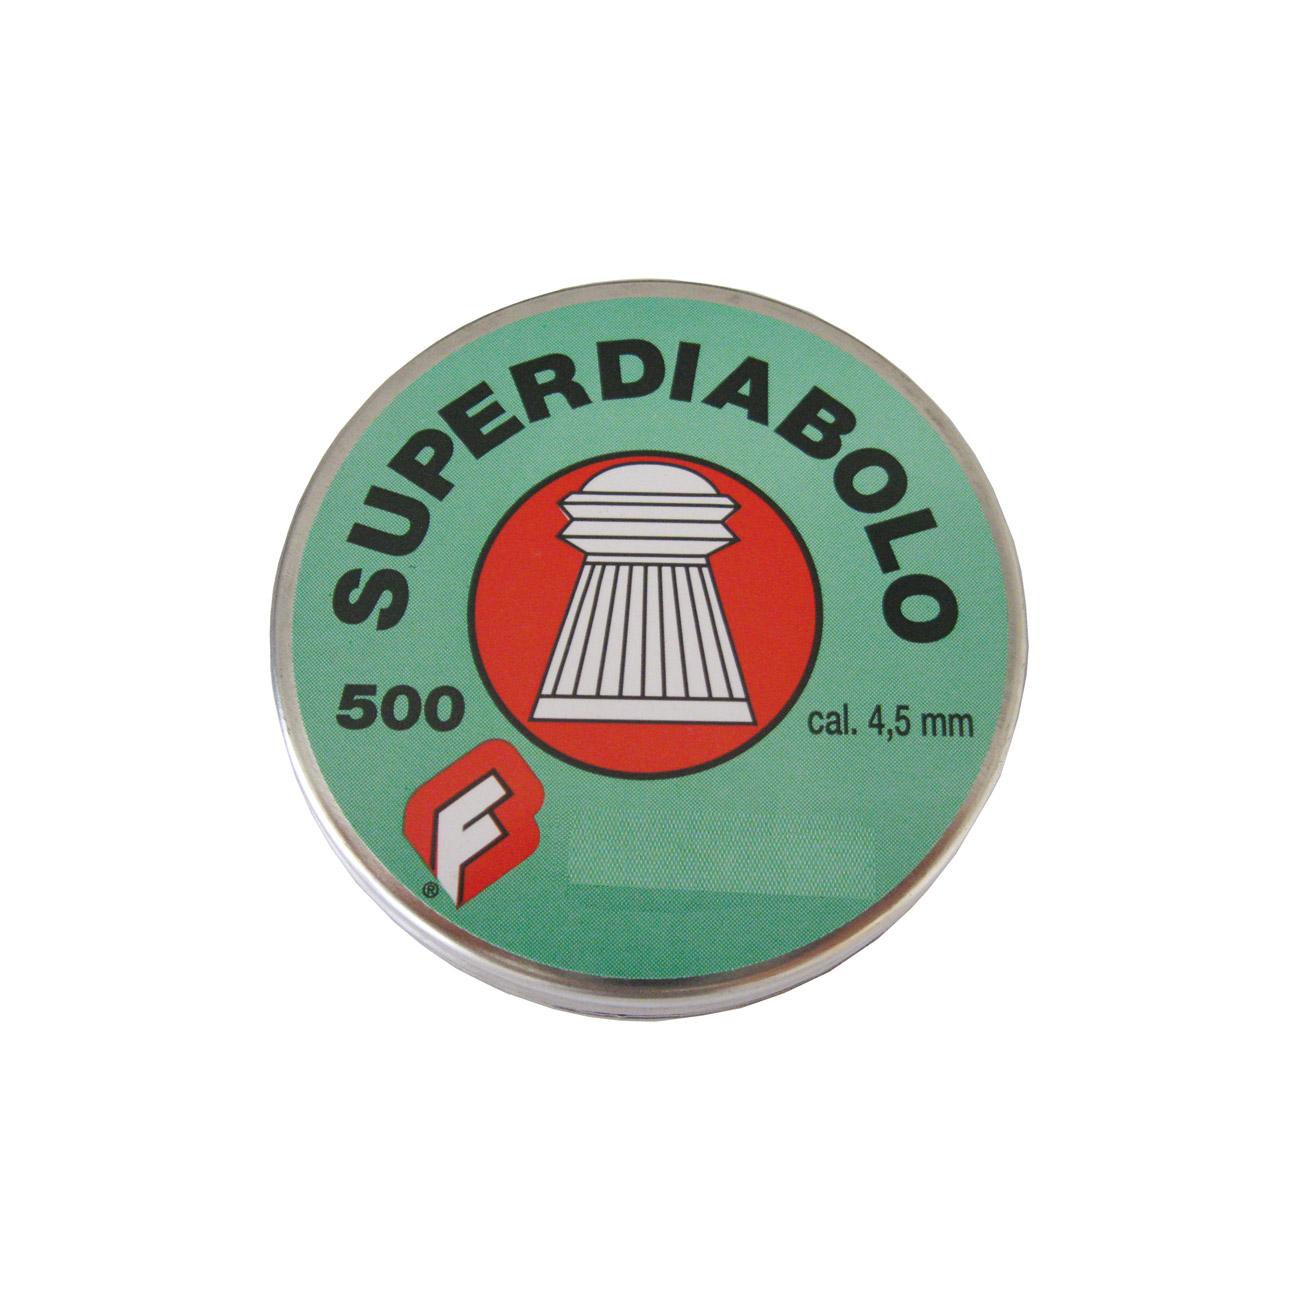 Pallini Super Diabolo Testa a Punta Ø 4,5 mm 500 pz